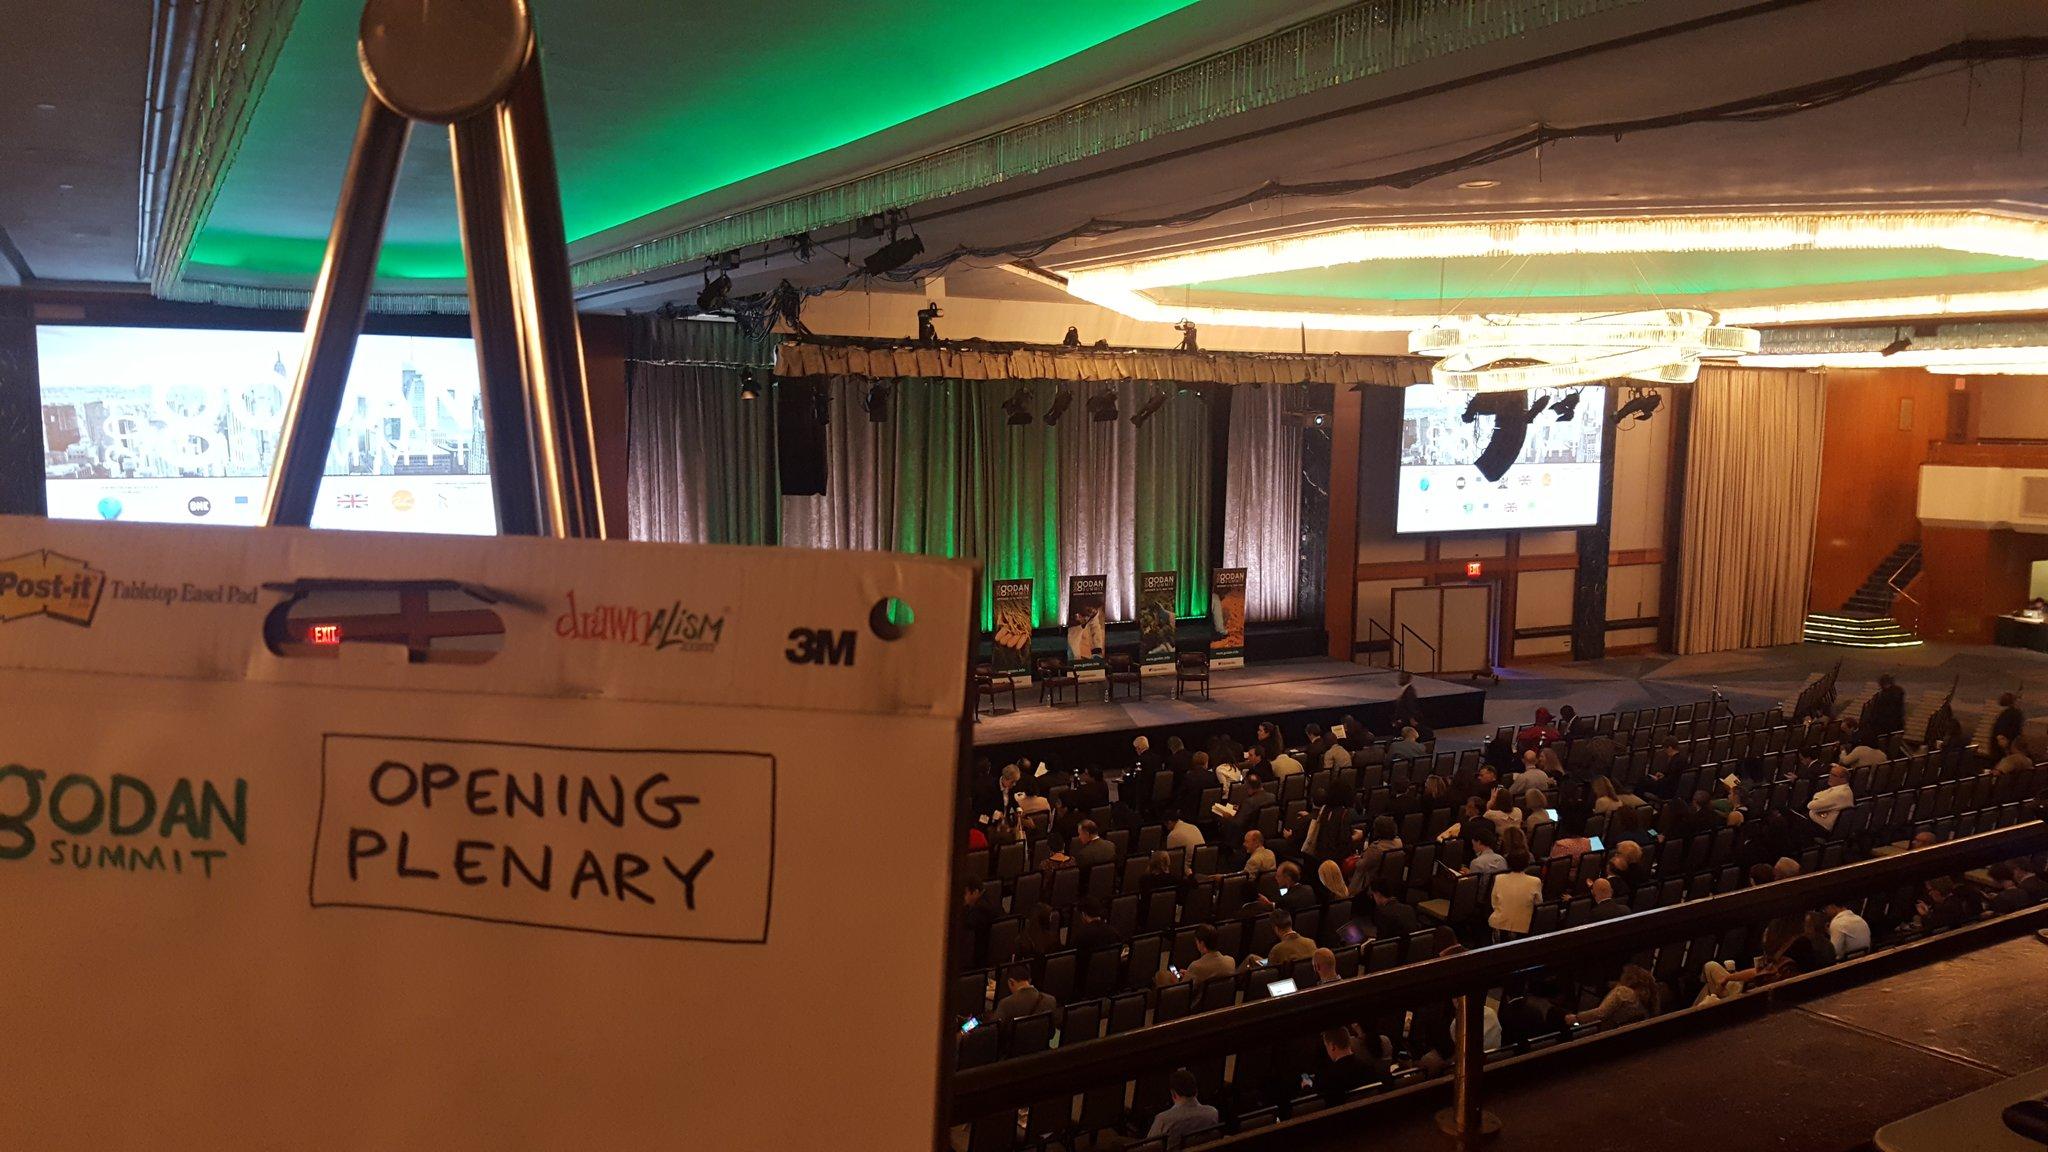 Waiting to start the Opening Plenary at #GODANSummit2016 https://t.co/5VrkrUpYhq